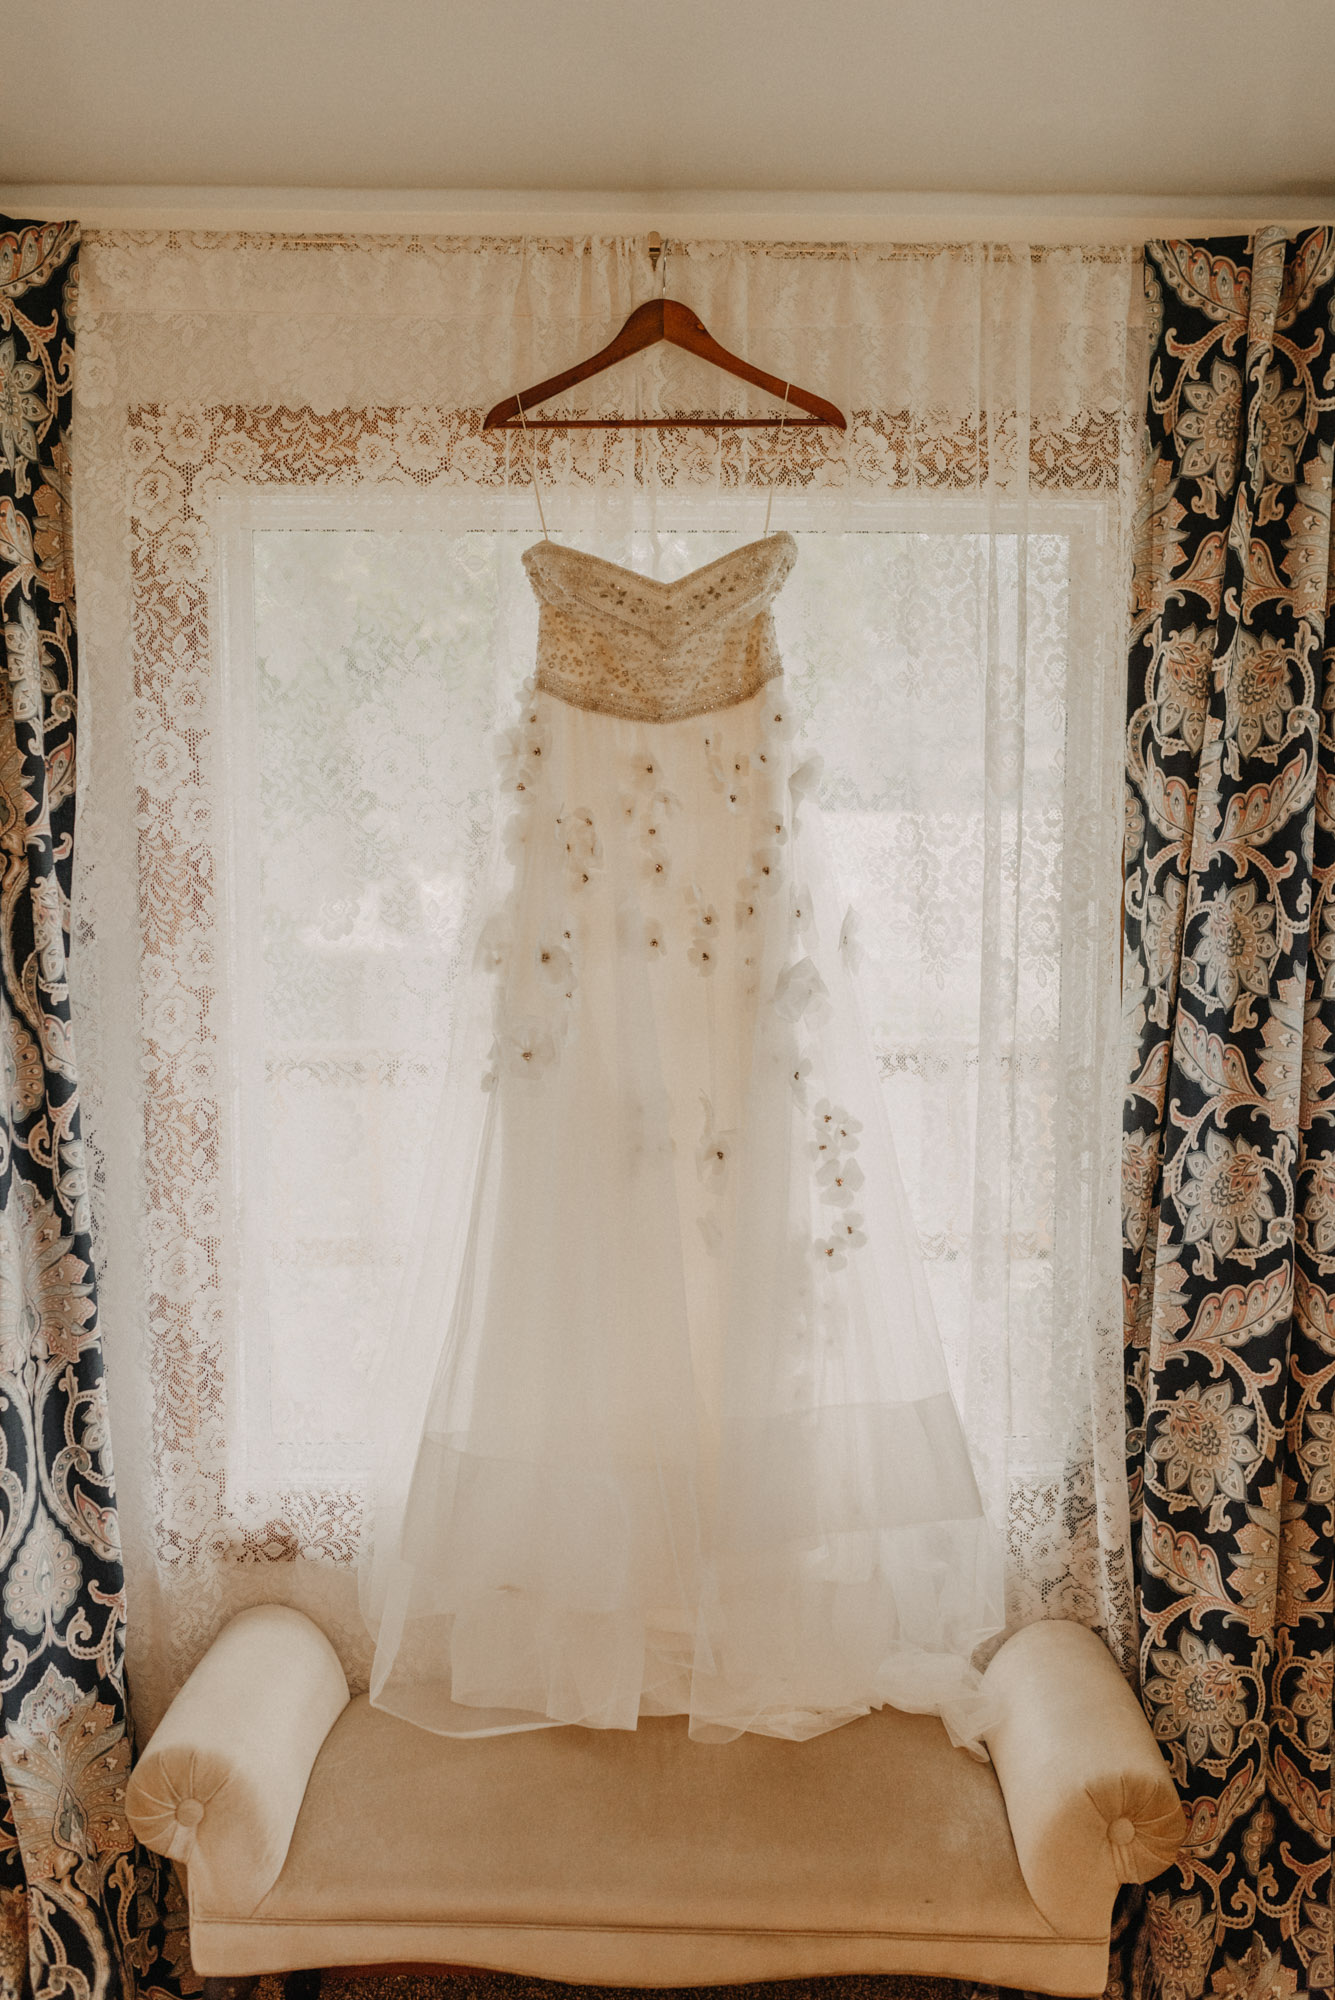 Getting-Ready-Swingset-Washington-Wedding-ringshot-7927.jpg